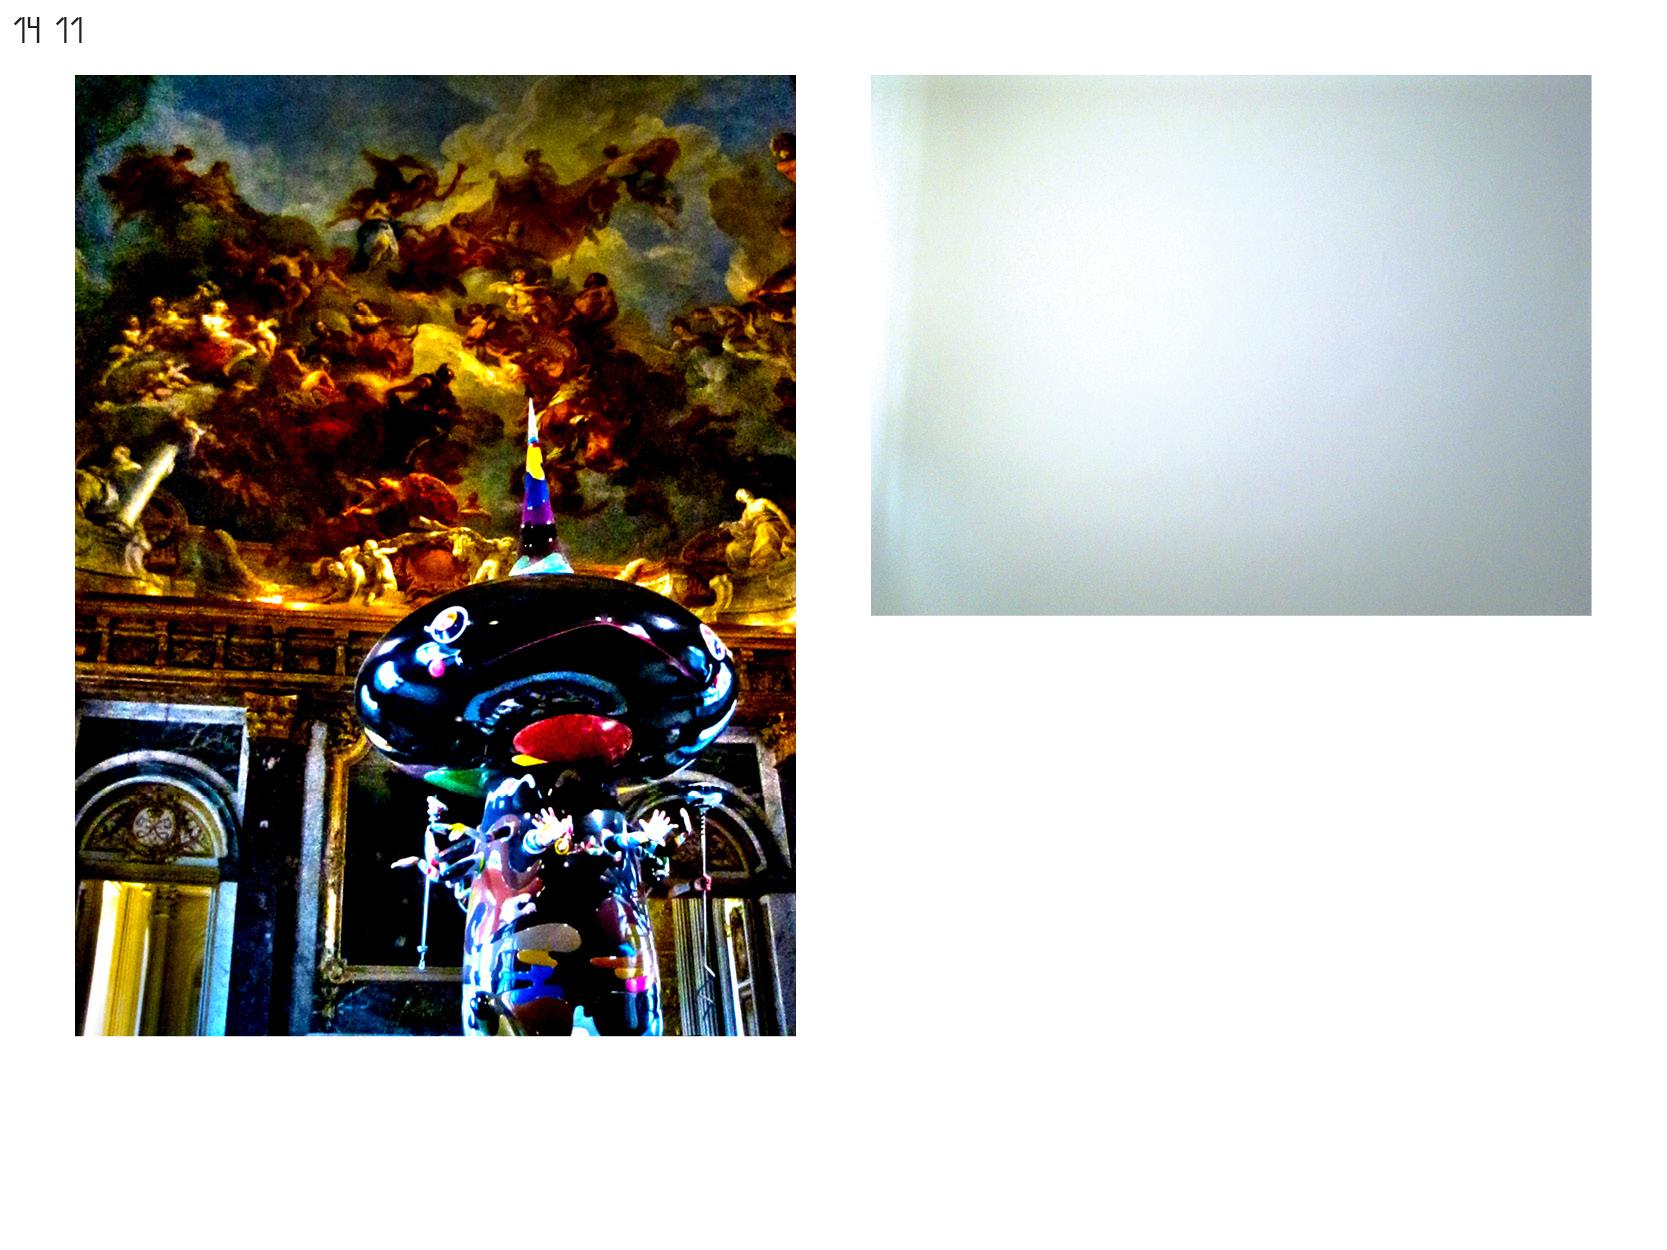 Gerrit-Schweiger-Dialog-Städte-Paris-Berlin-Jessica-Blank-Experiment-Fotoserie-Tagebuch-visuelle-Kommunikation-29